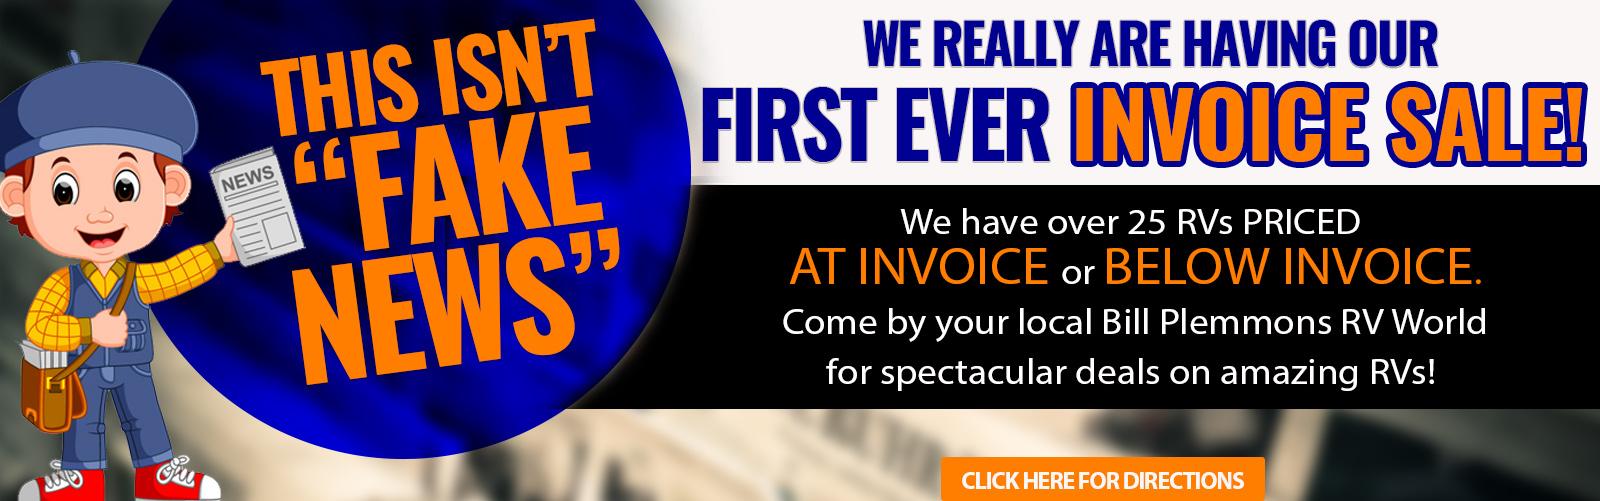 Bill Plemmons RV Invoice Sale